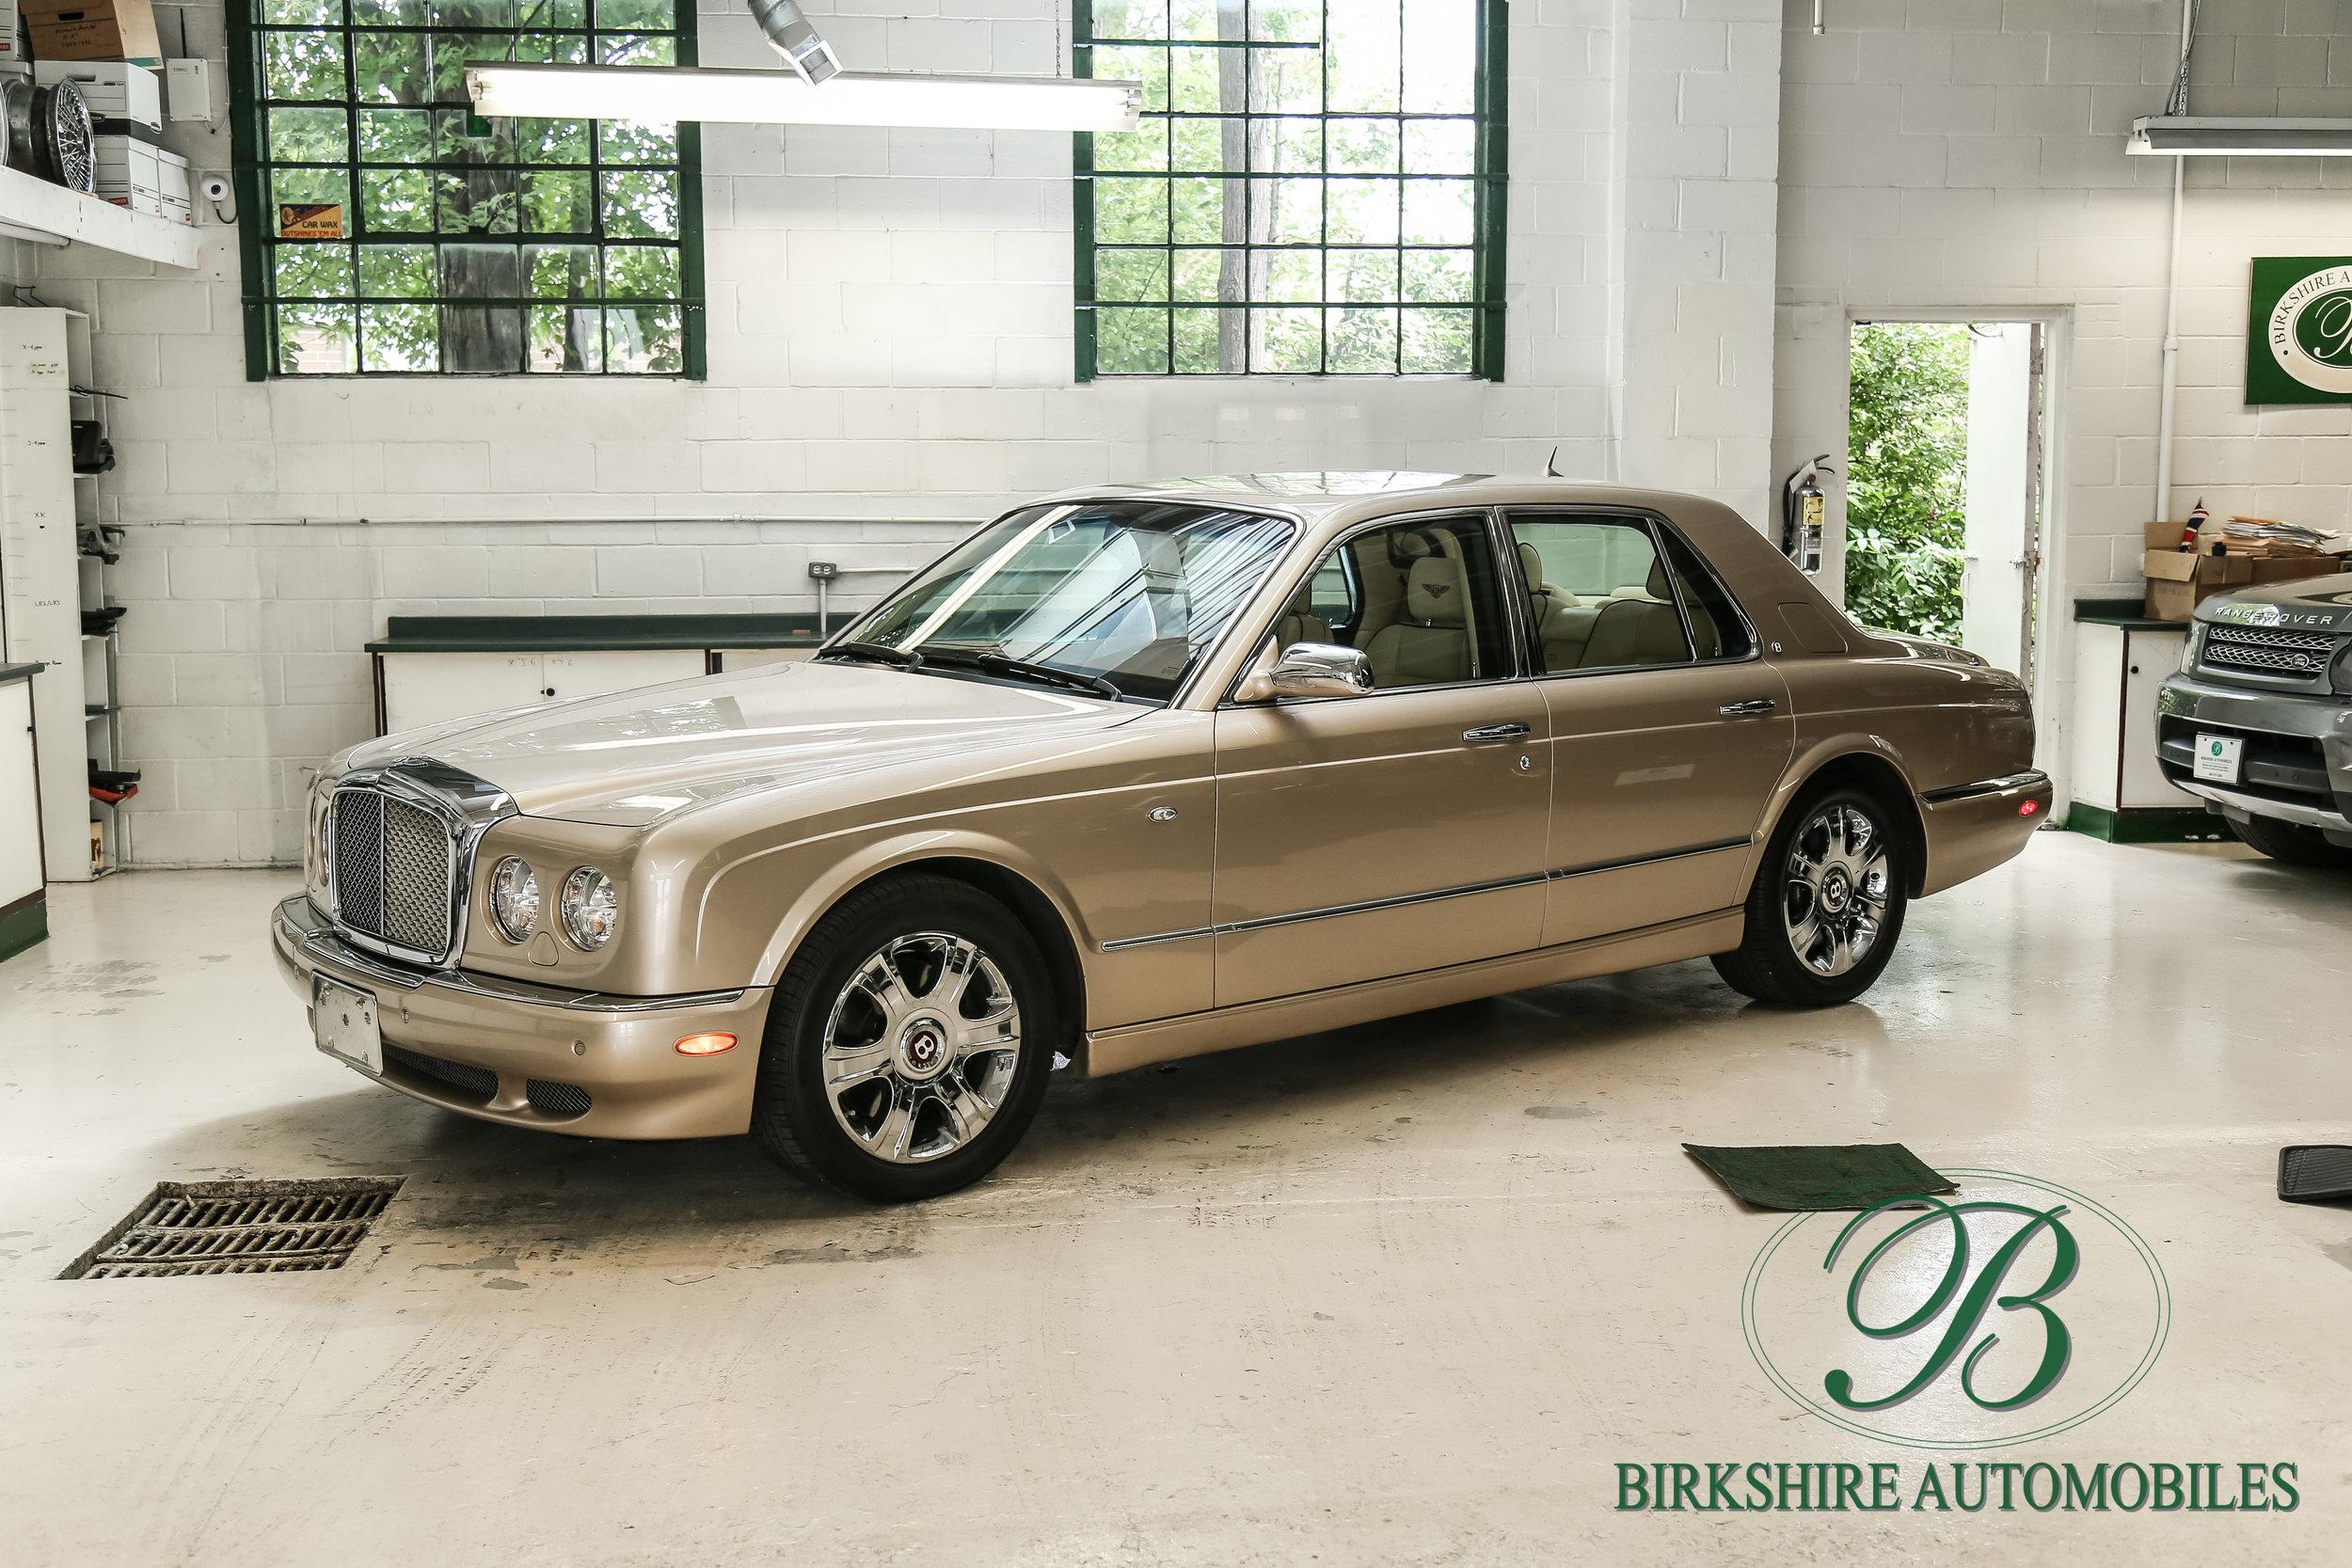 Birkshire Automobiles-318.jpg